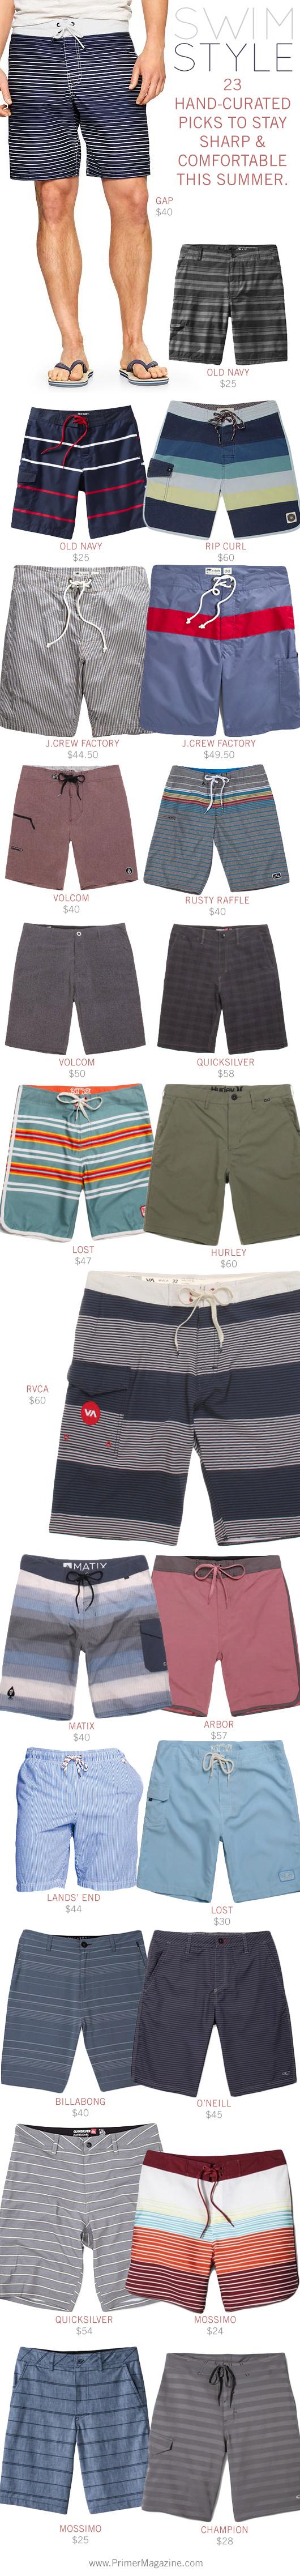 Swim Style collage with 23 swim trunk options